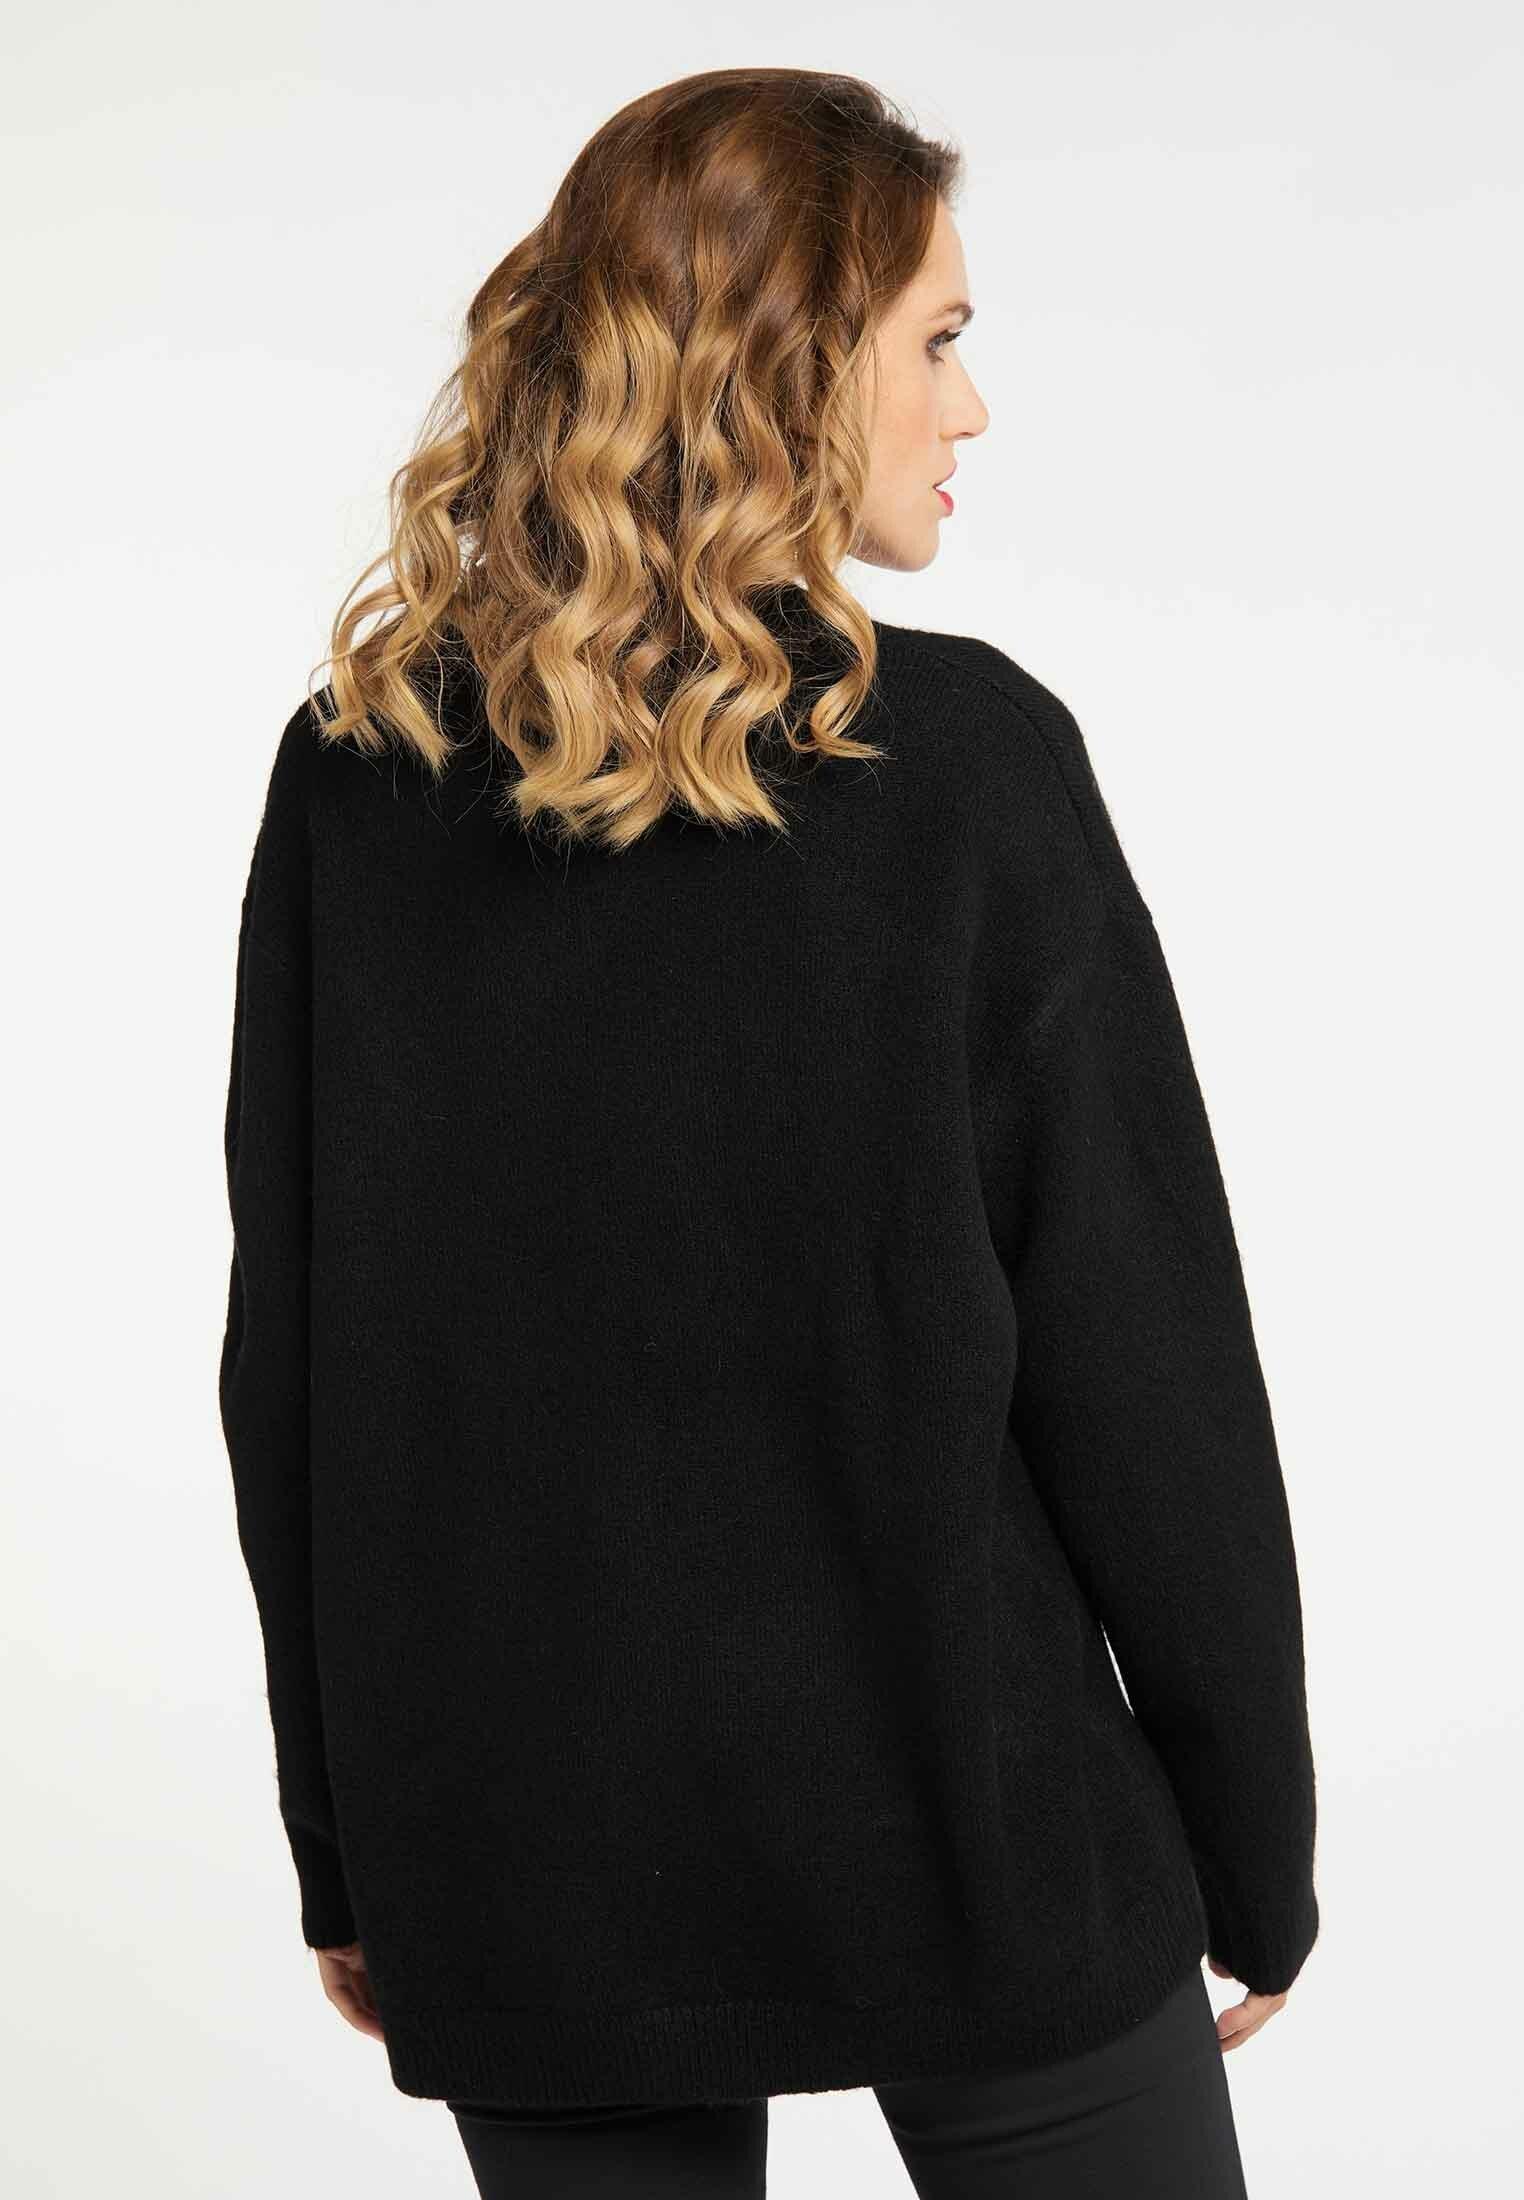 faina Pullover - black - Pulls & Gilets Femme ve4Zx